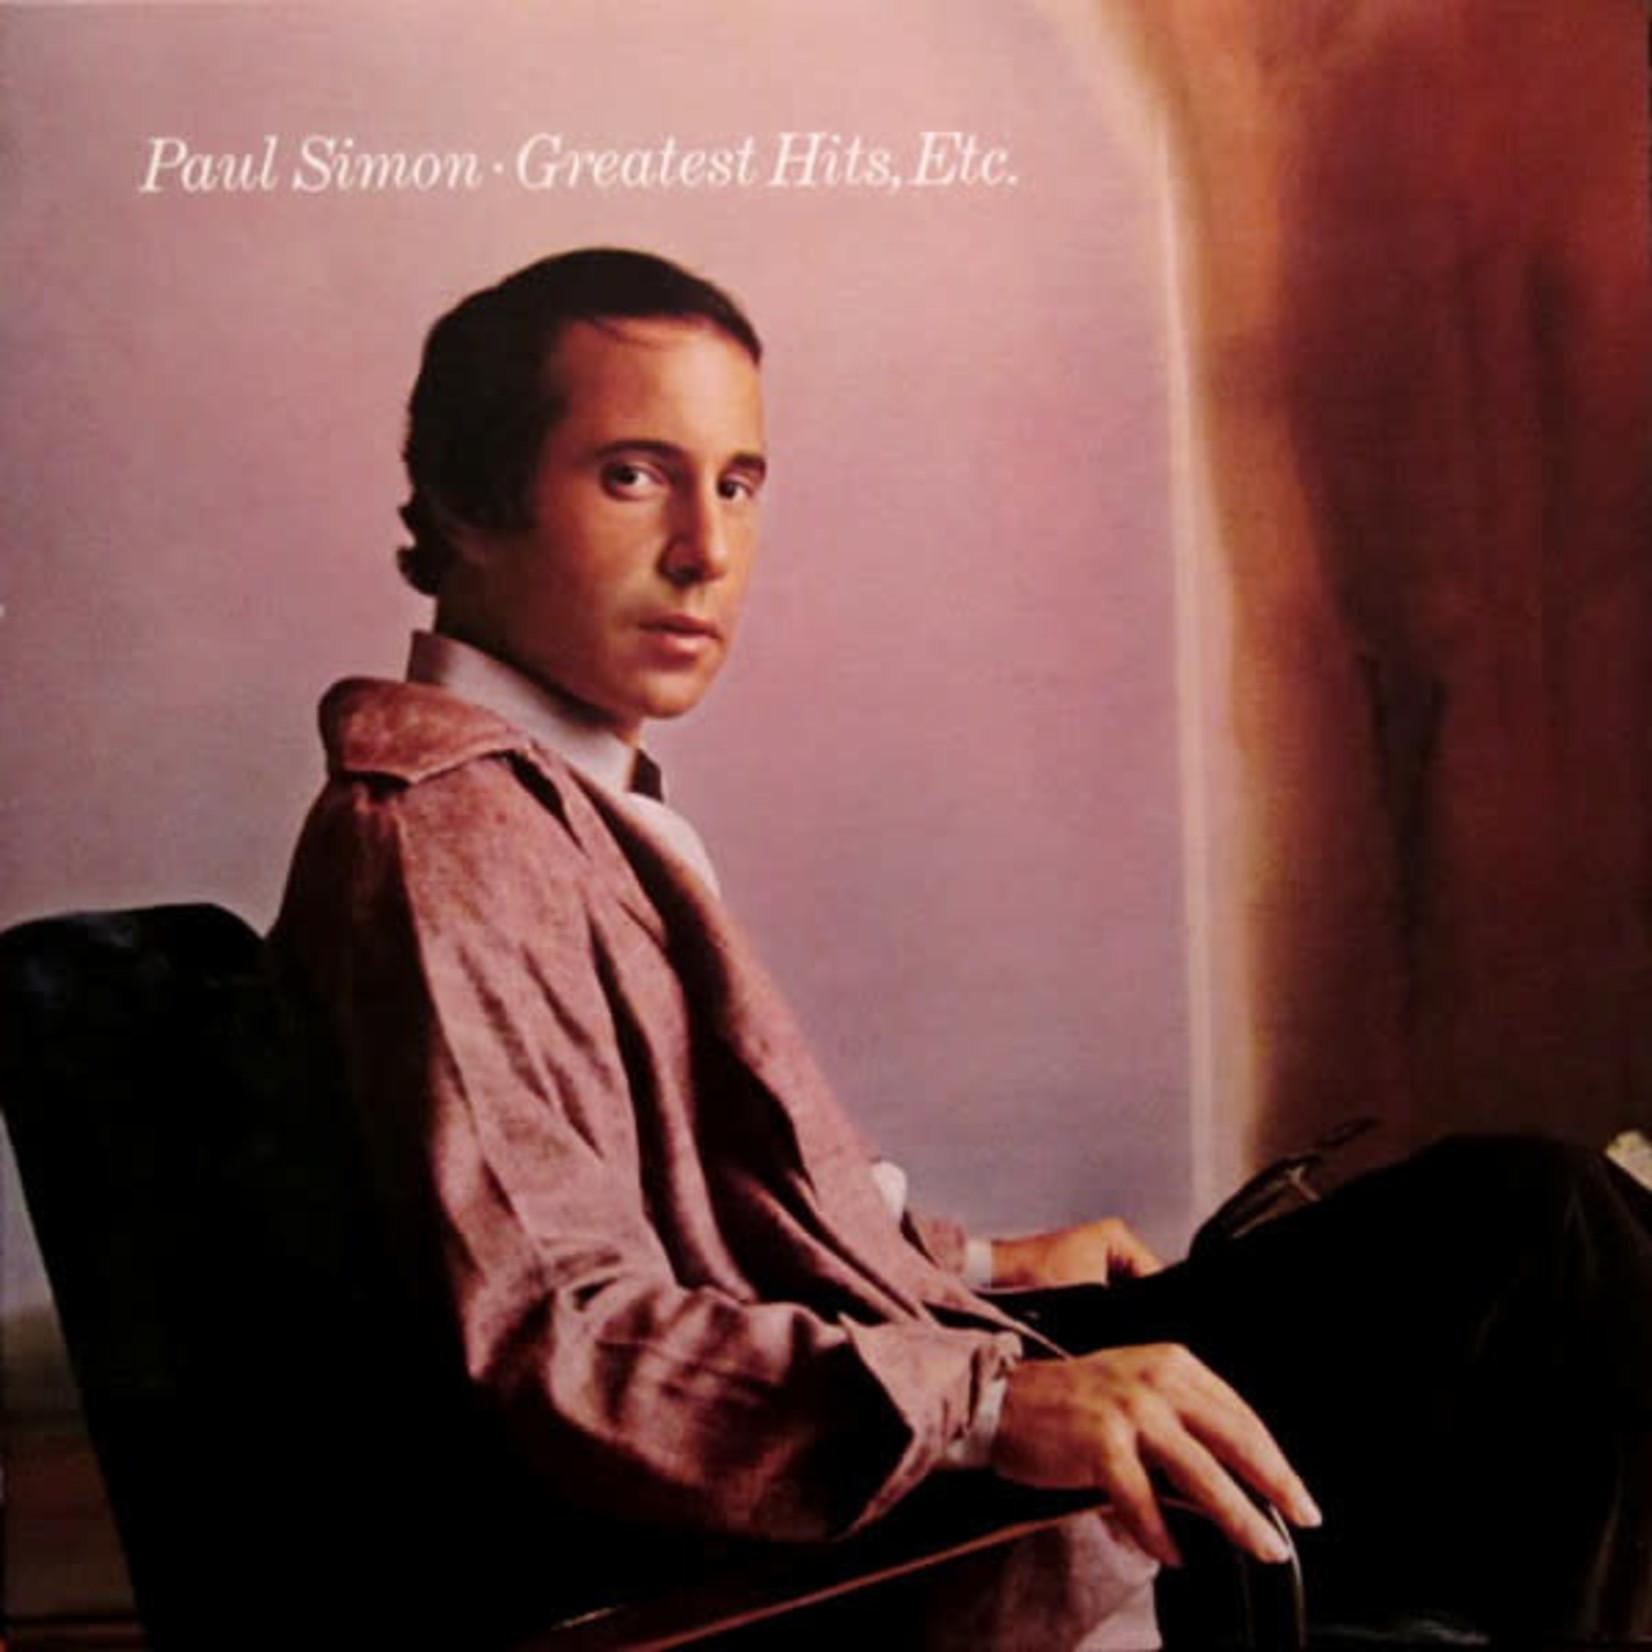 [Vintage] Simon, Paul: Greatest Hits Etc